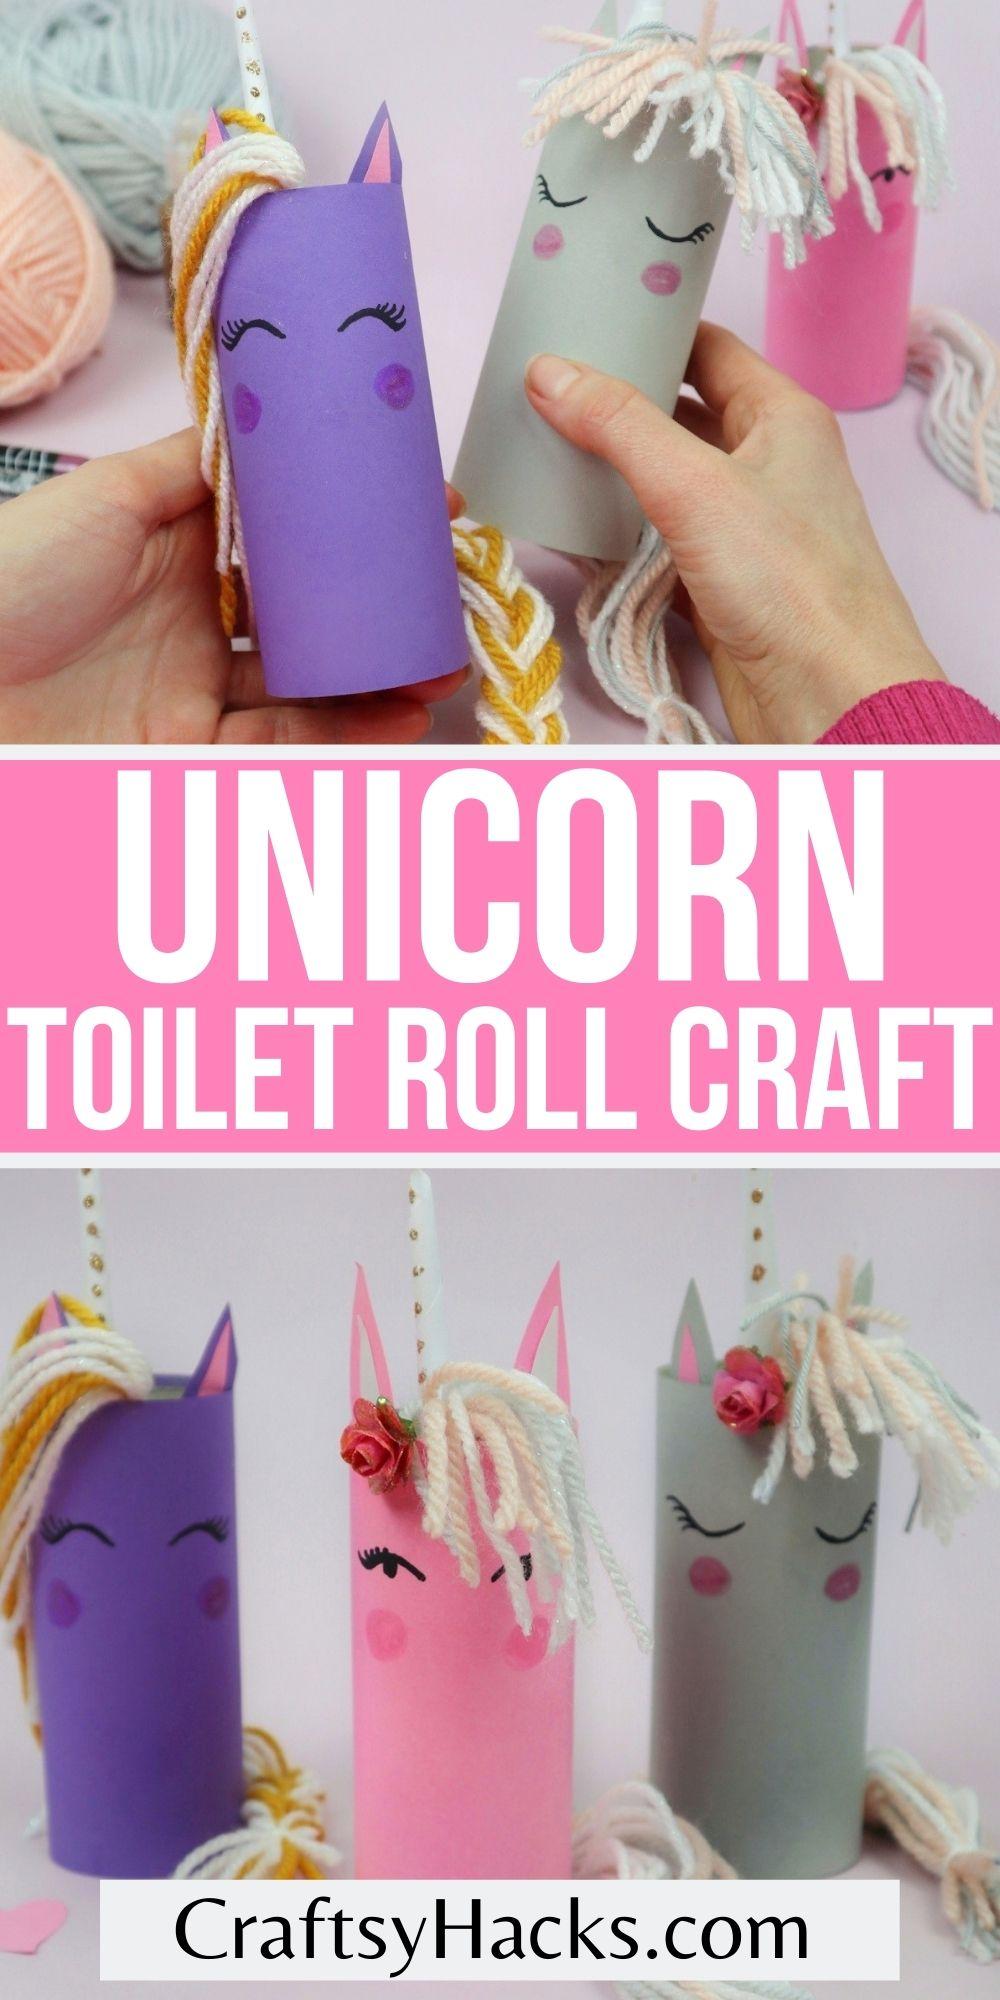 unicorn toilet roll crafts